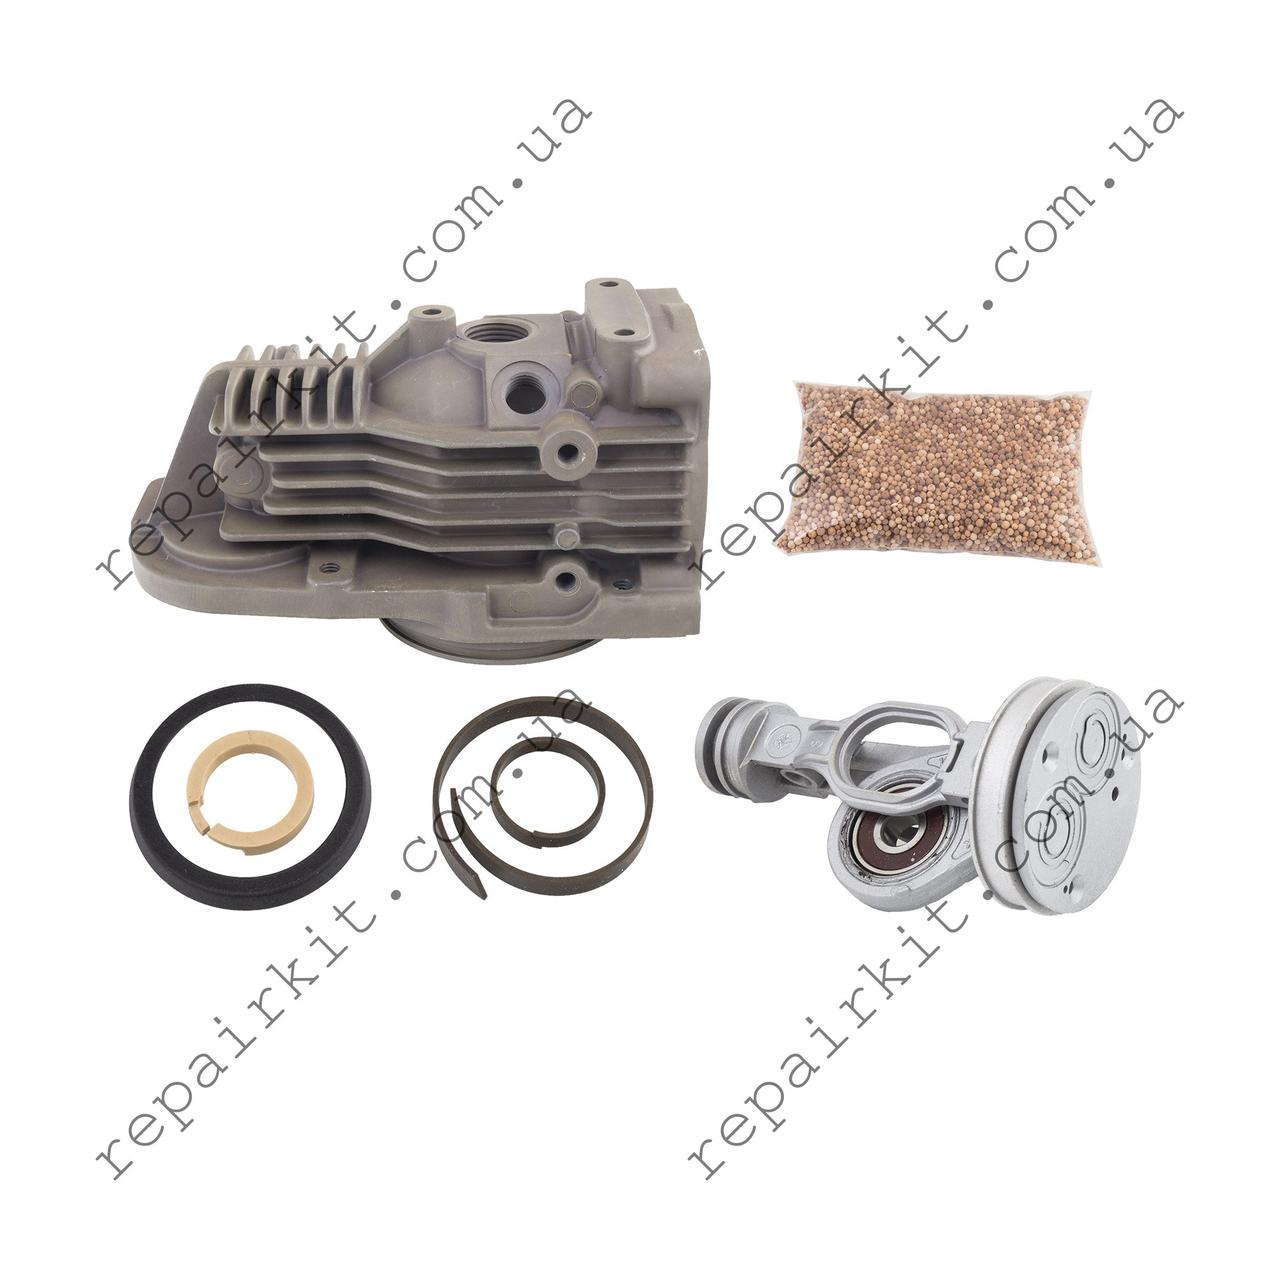 Ремкомплект компрессора пневмоподвески AMK (Mercedes W164, W251 и BMW E61)